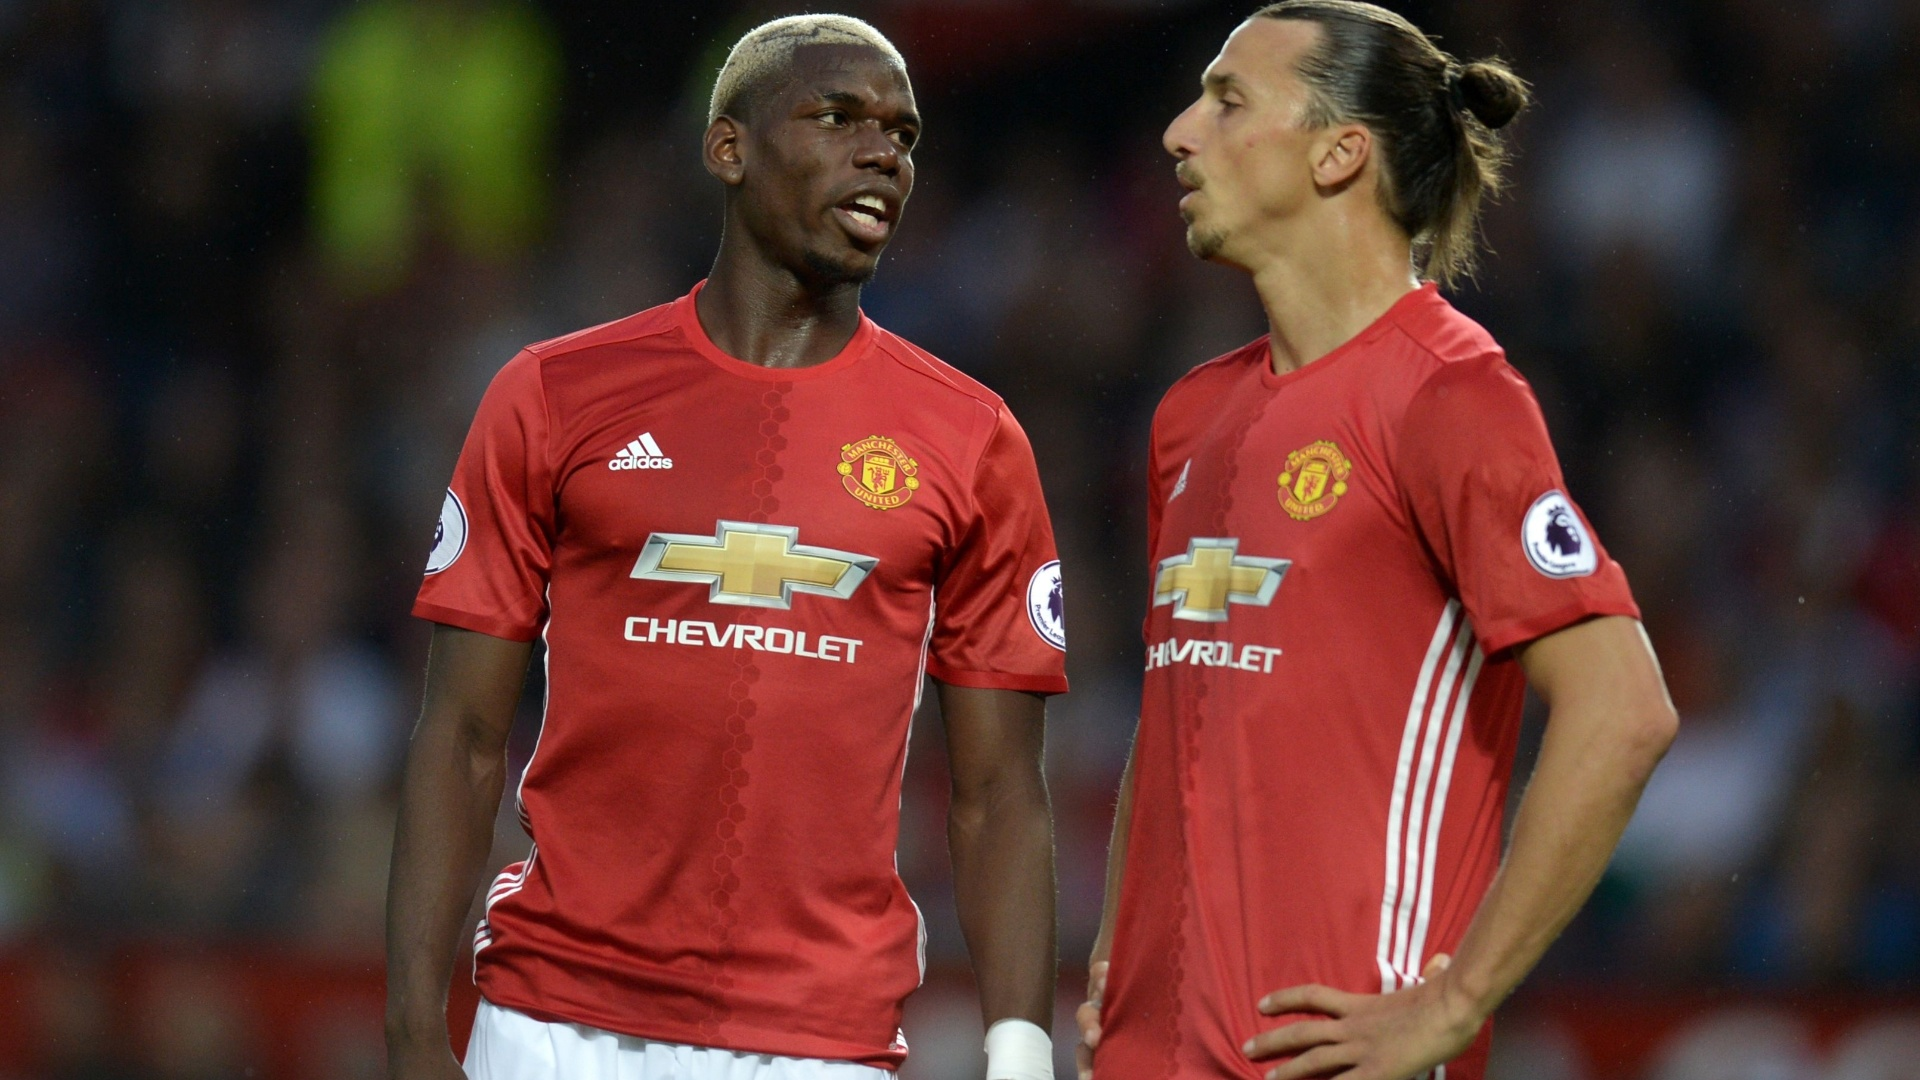 Pogba e Ibrahimovic conversam durante partida do Manchester United